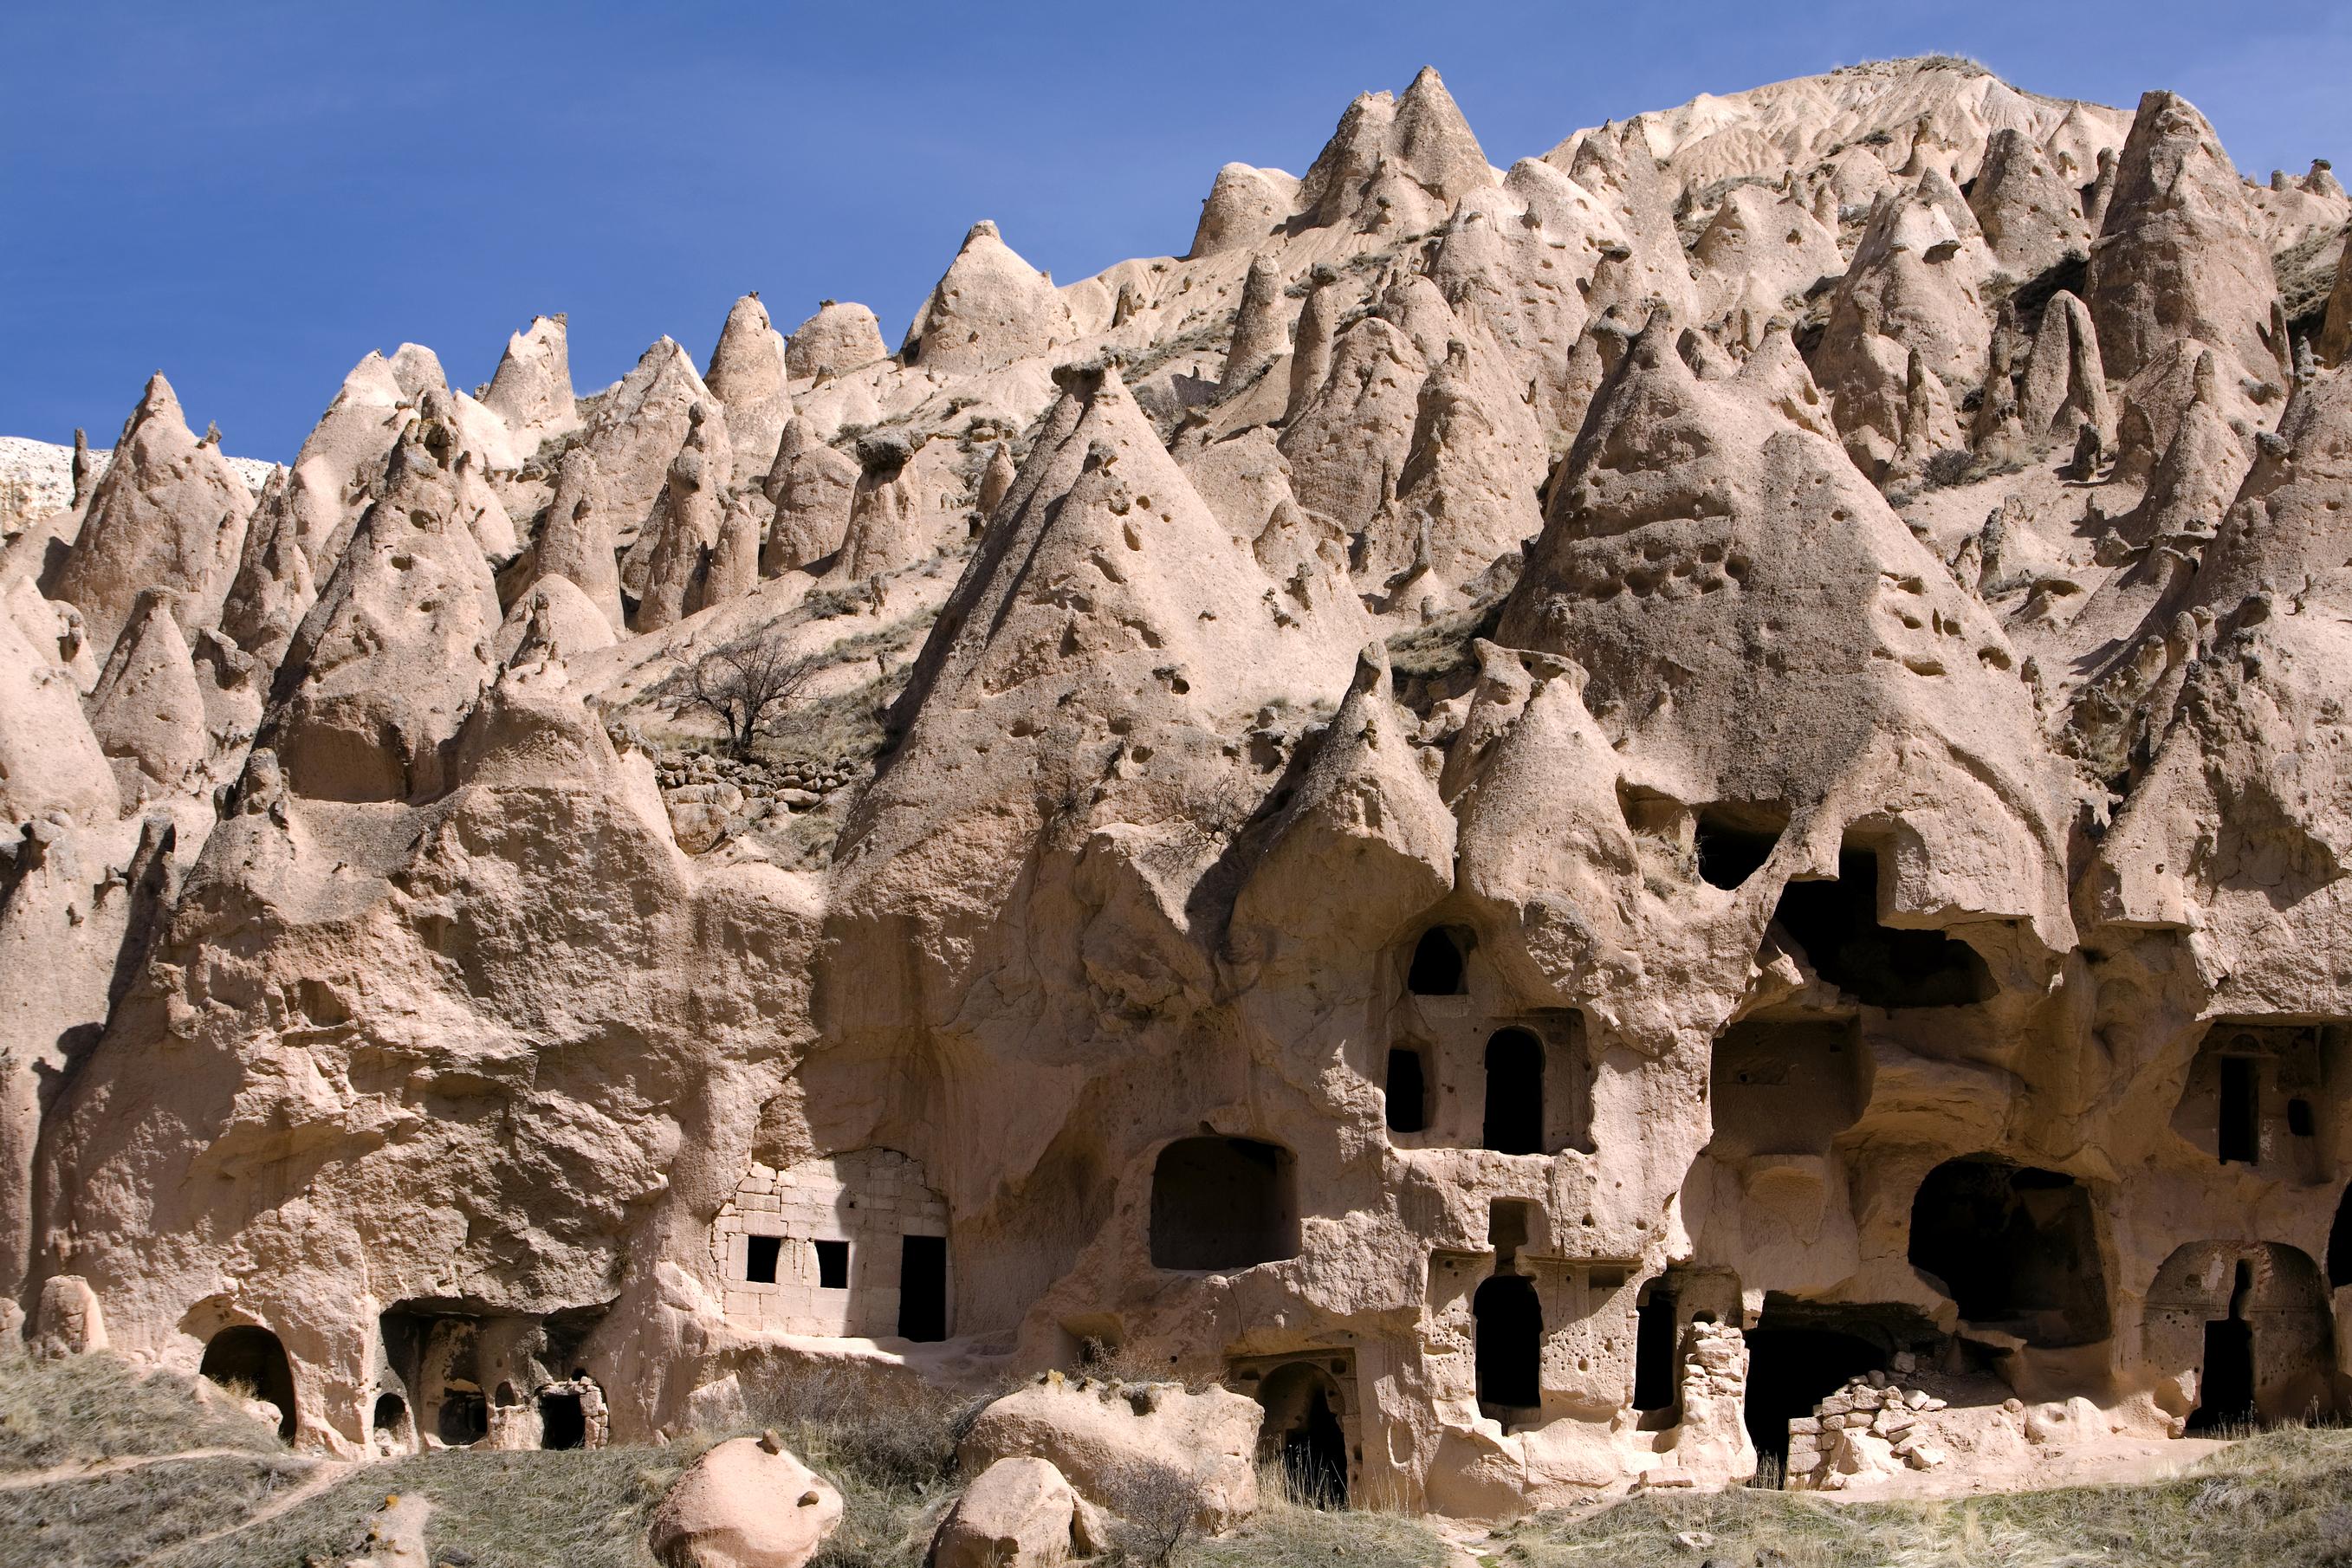 Ancient cavetown near Goreme, Cappadocia, Turkey (Getty Images/iStock)